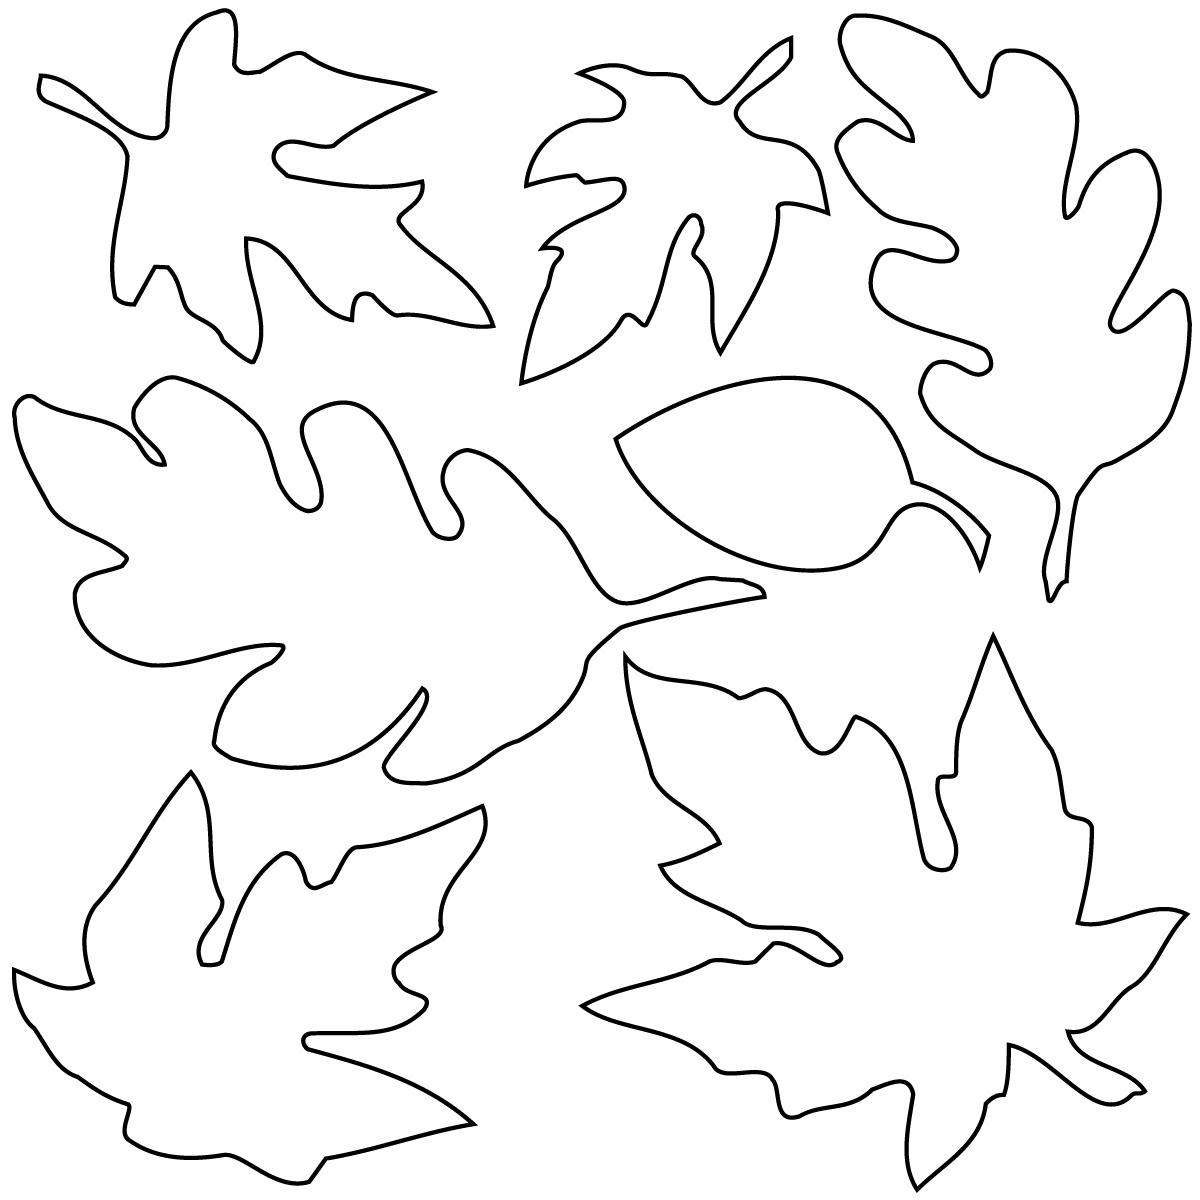 Free Oak Leaf Graphic, Download Free Clip Art, Free Clip Art On - Free Printable Oak Leaf Patterns